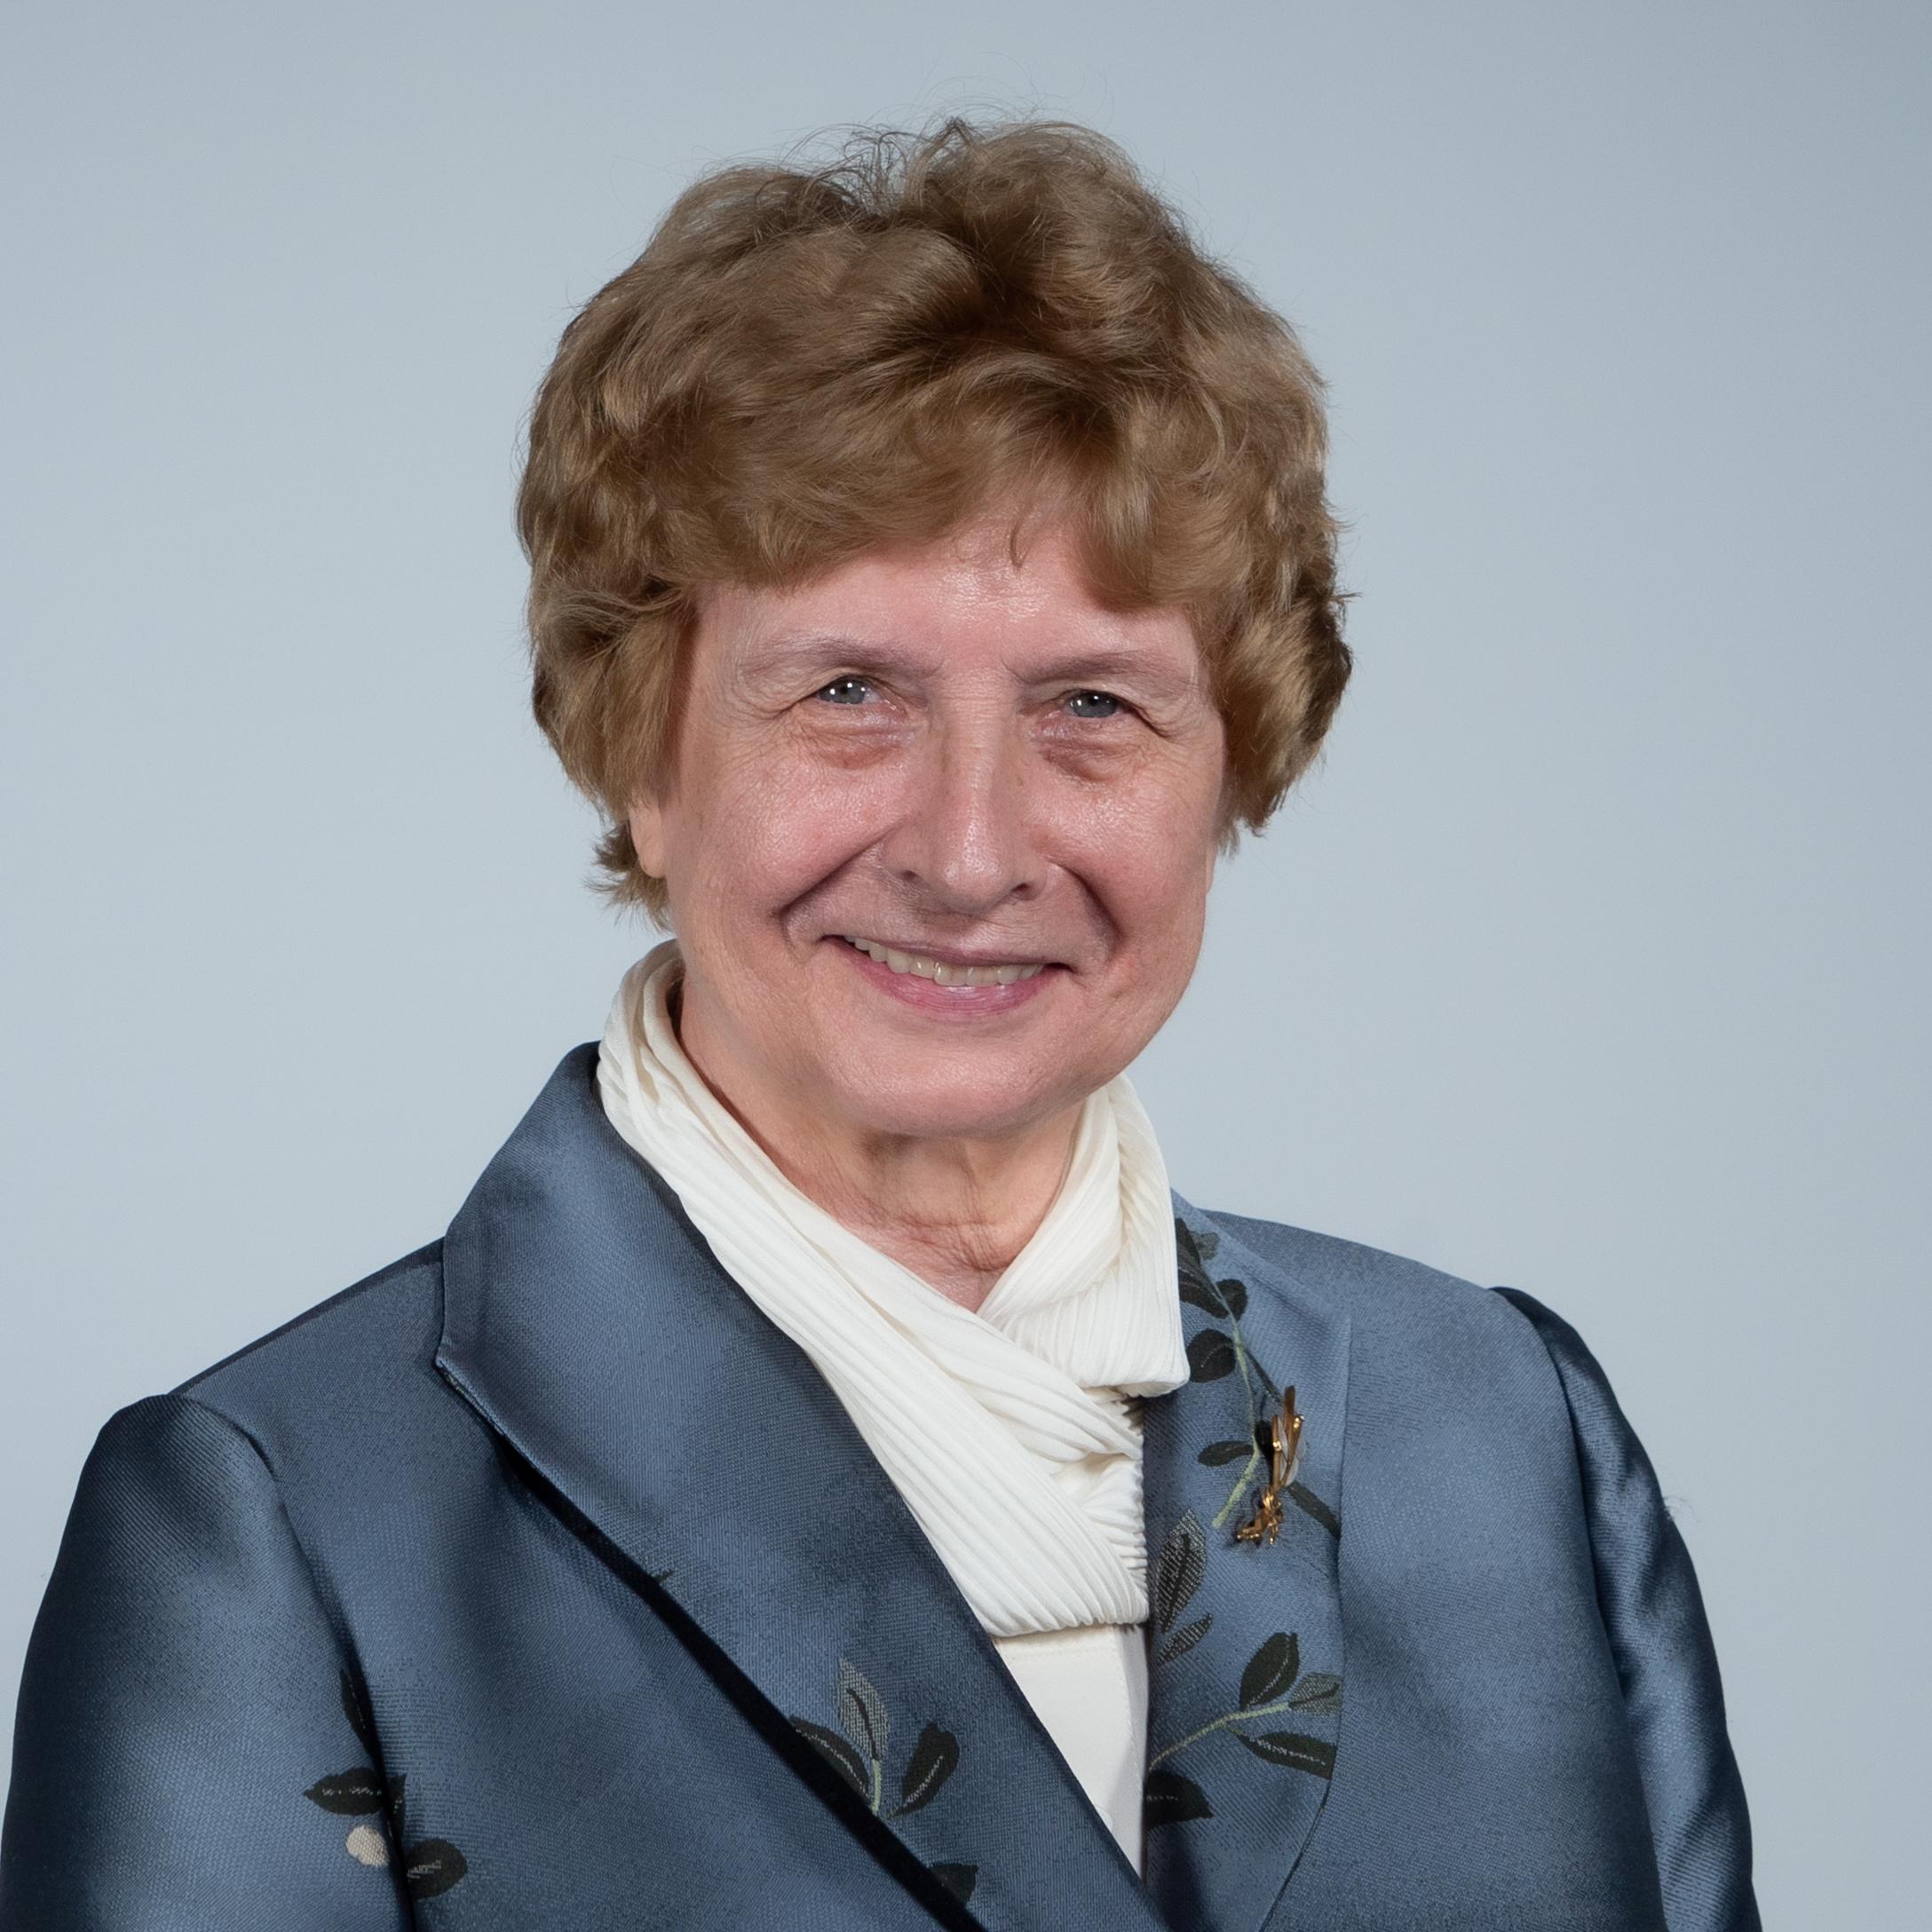 Афанасьева Ольга Васильевна